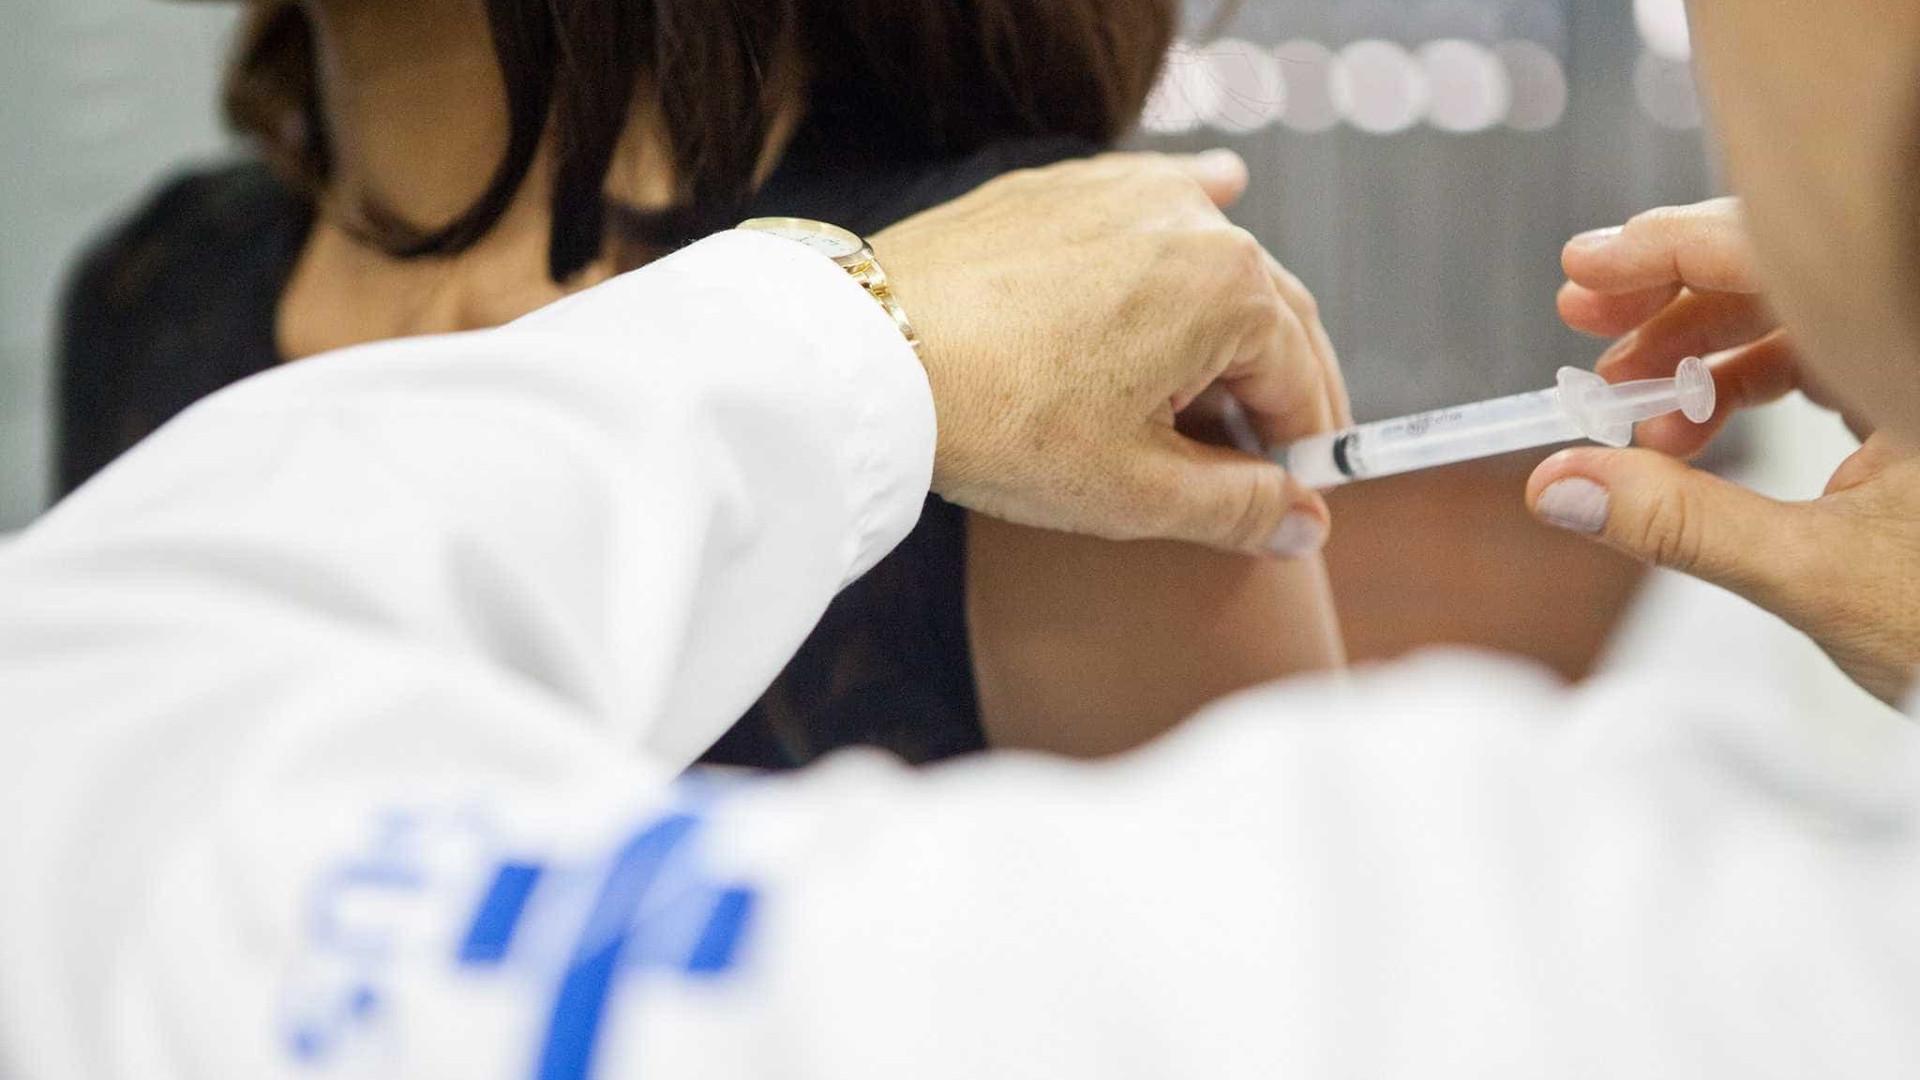 Vacina da febre amarela será exportada a partir de julho